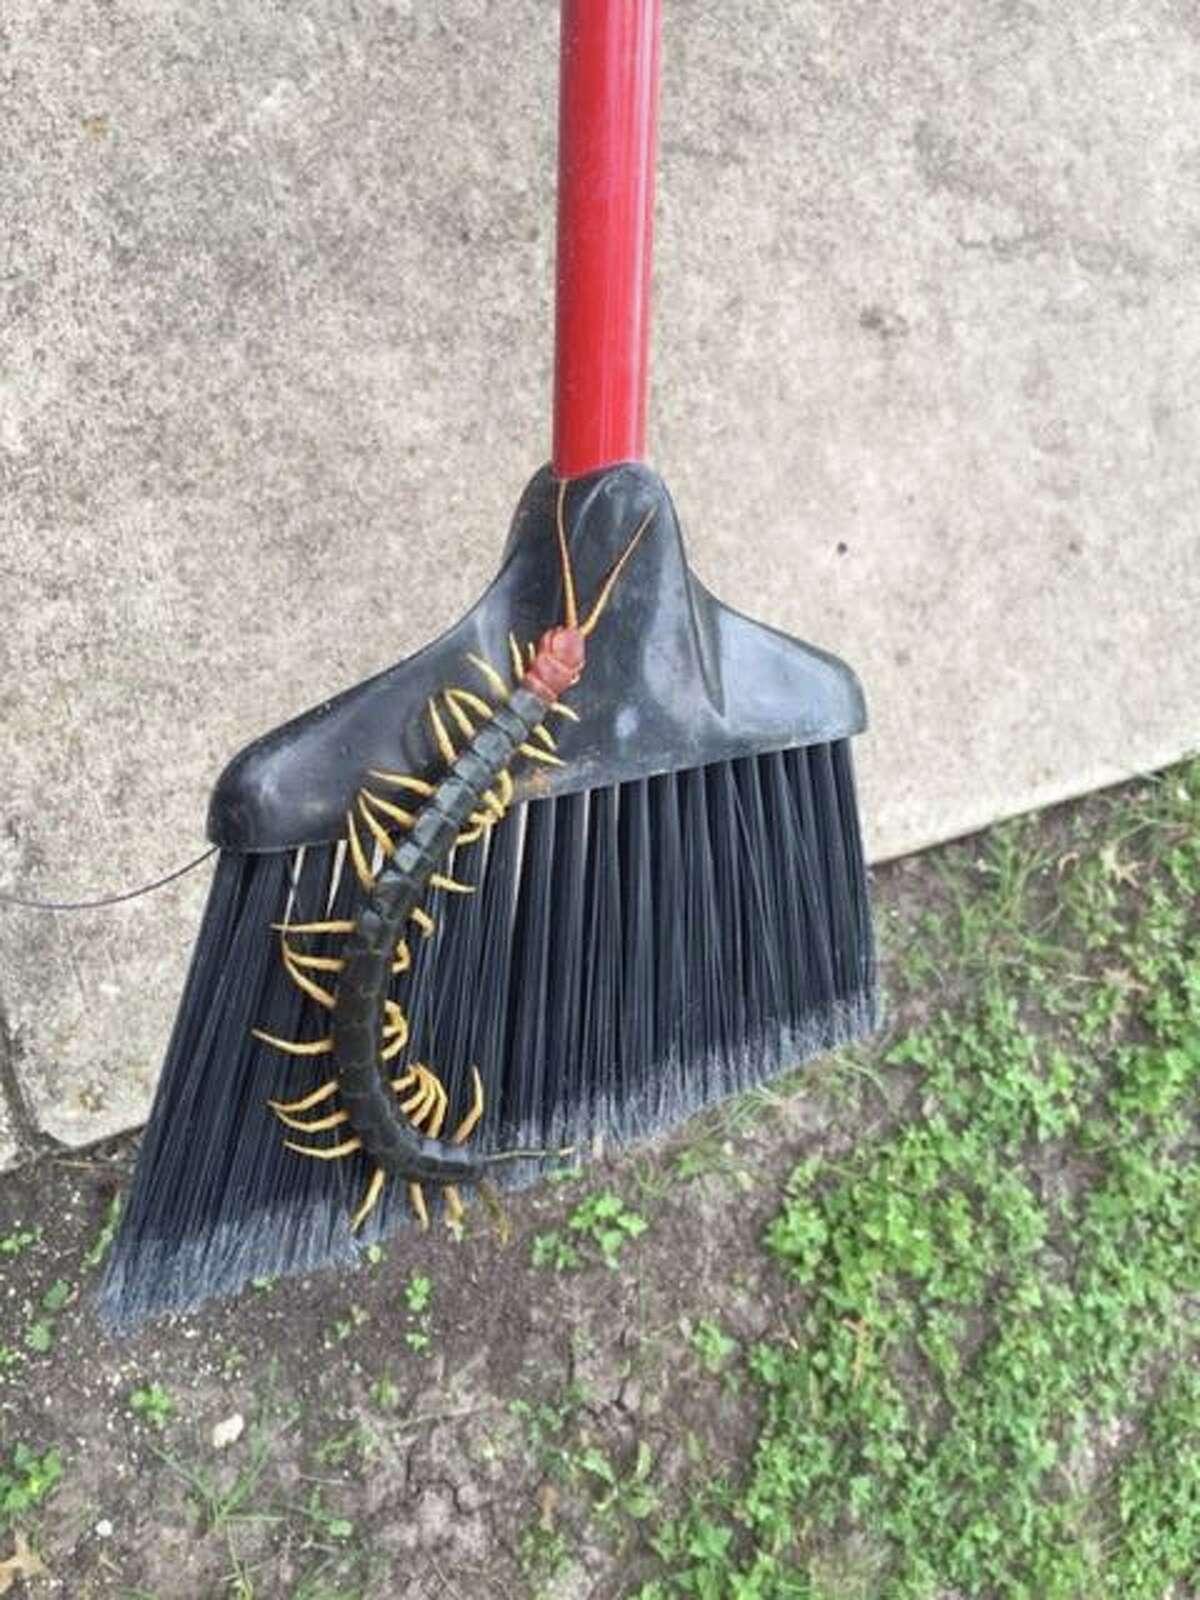 Texas Redheaded CentipedeREAD MORE:Texas' nightmare-inducing centipede caught on camera in Garner State Park